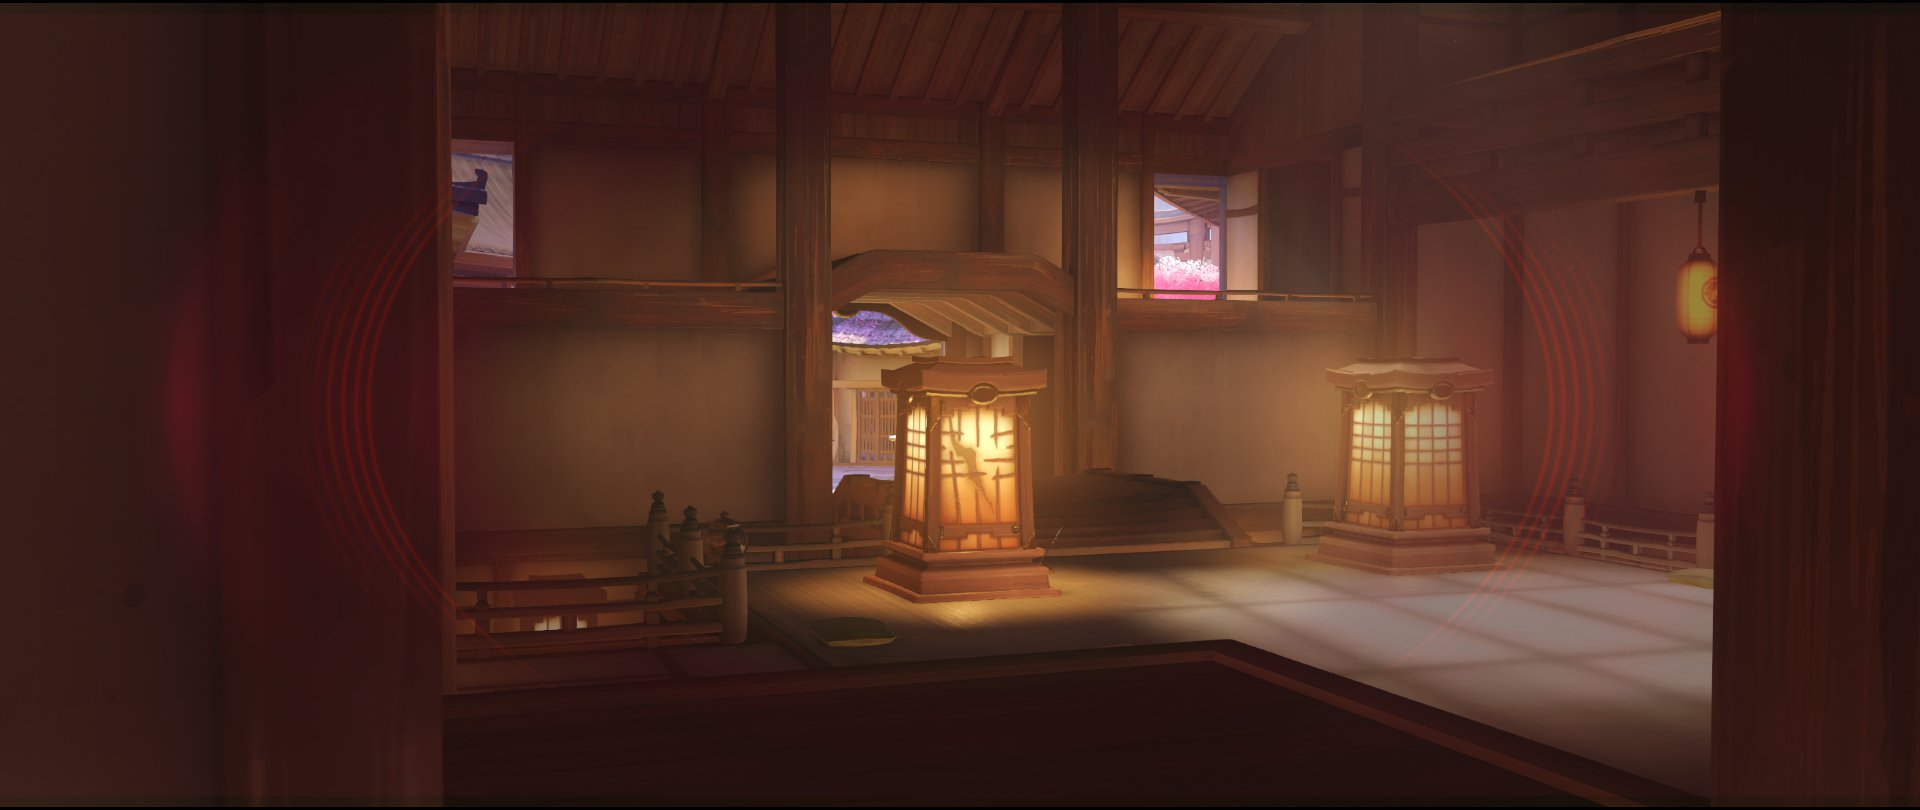 Stage left view defense Widowmaker sniping spot Hanamura Overwatch.jpg